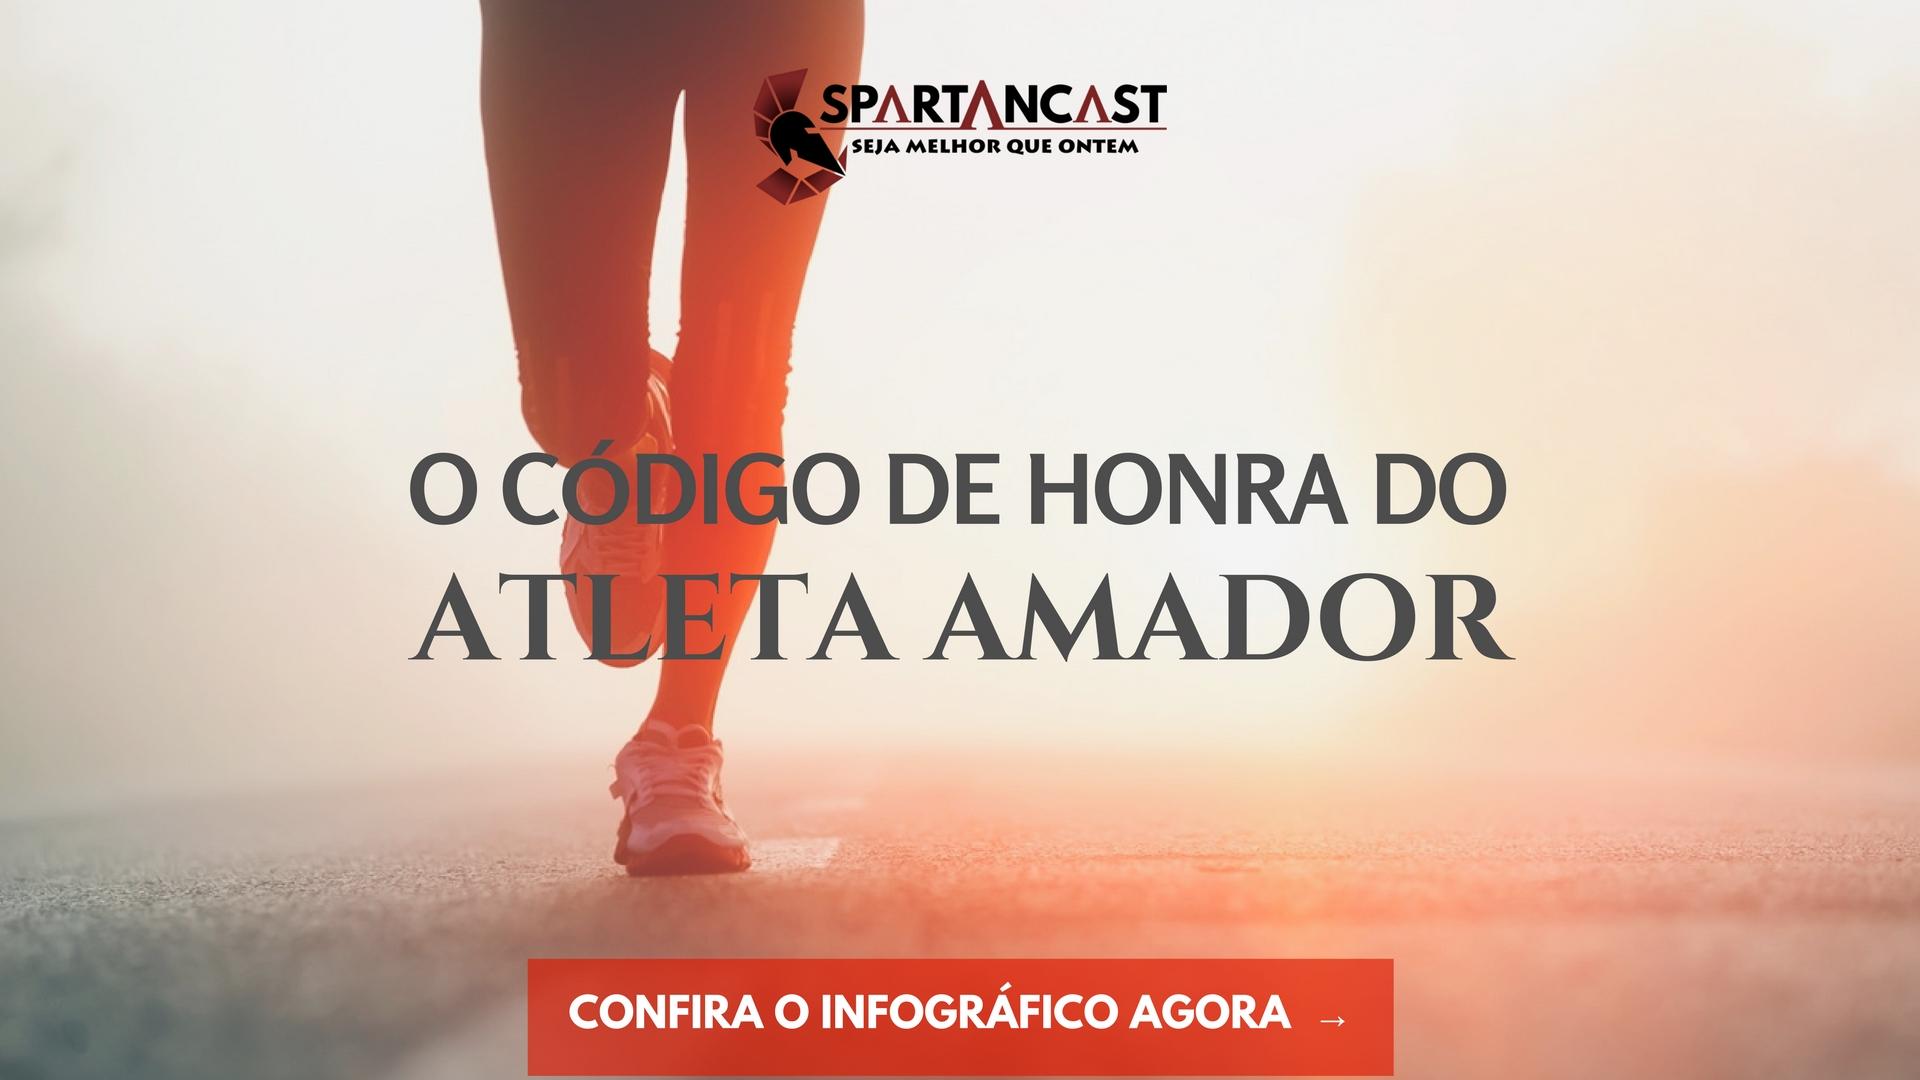 O Código de Honra do Atleta Amador